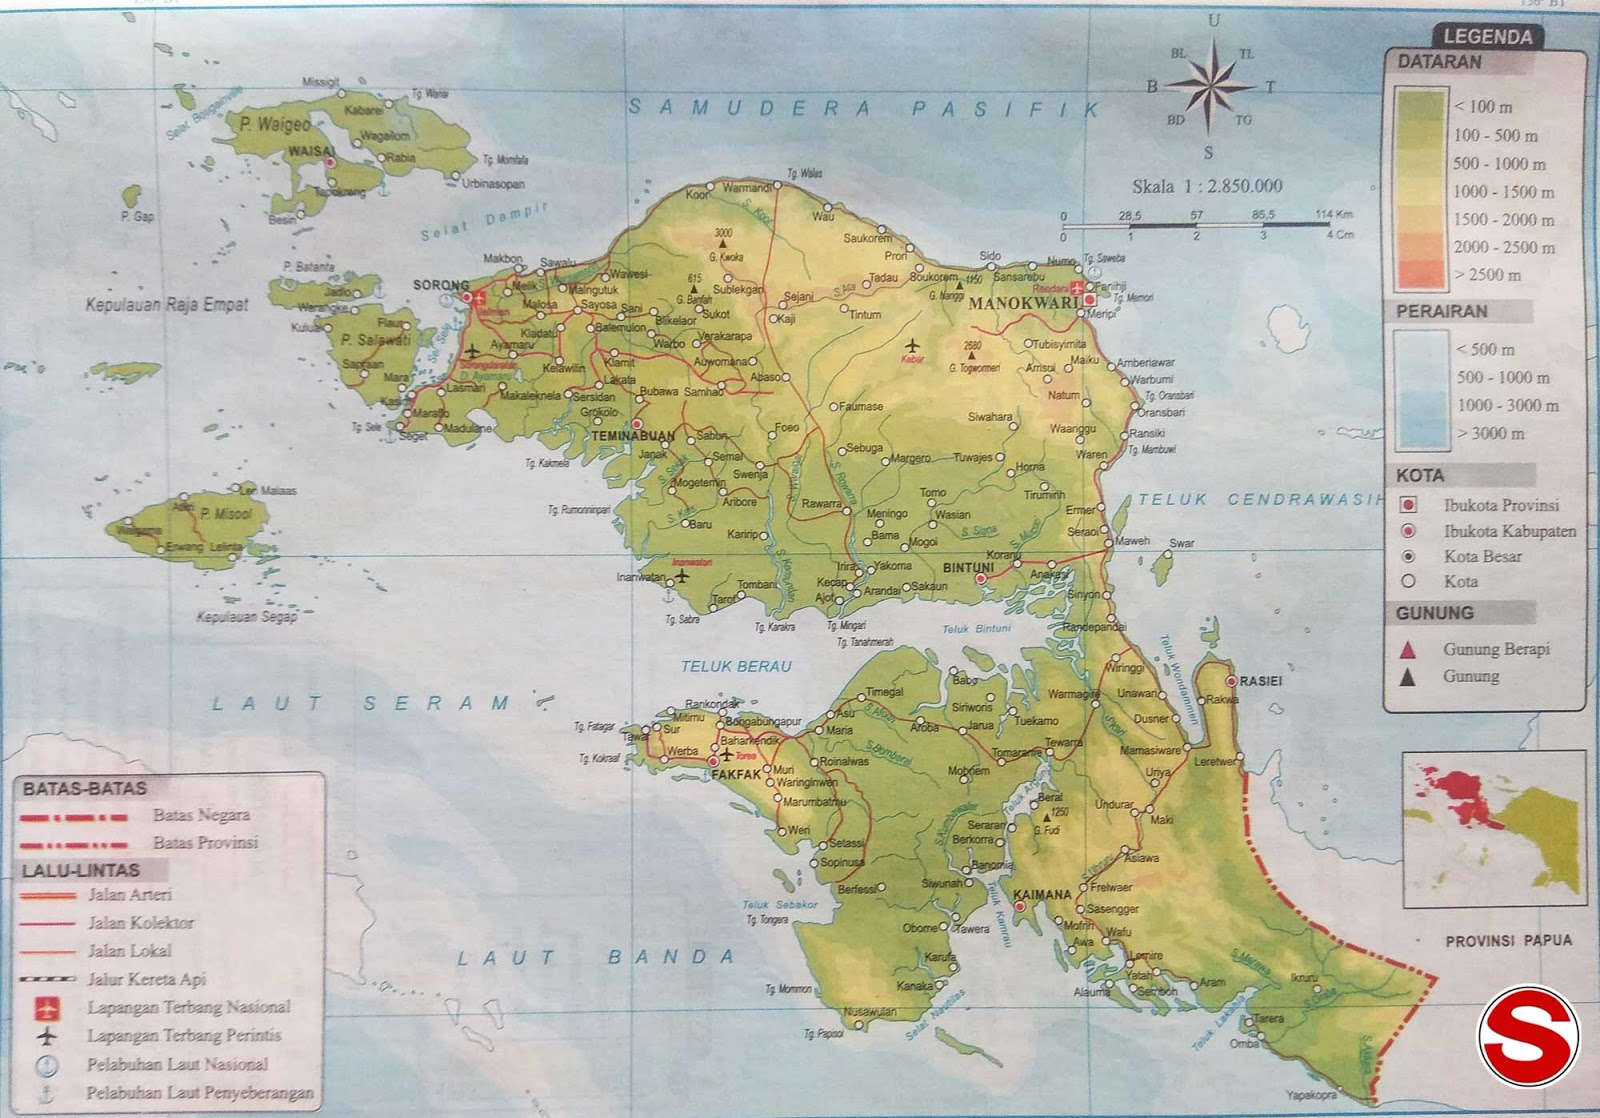 image: Peta atlas Papua Barat